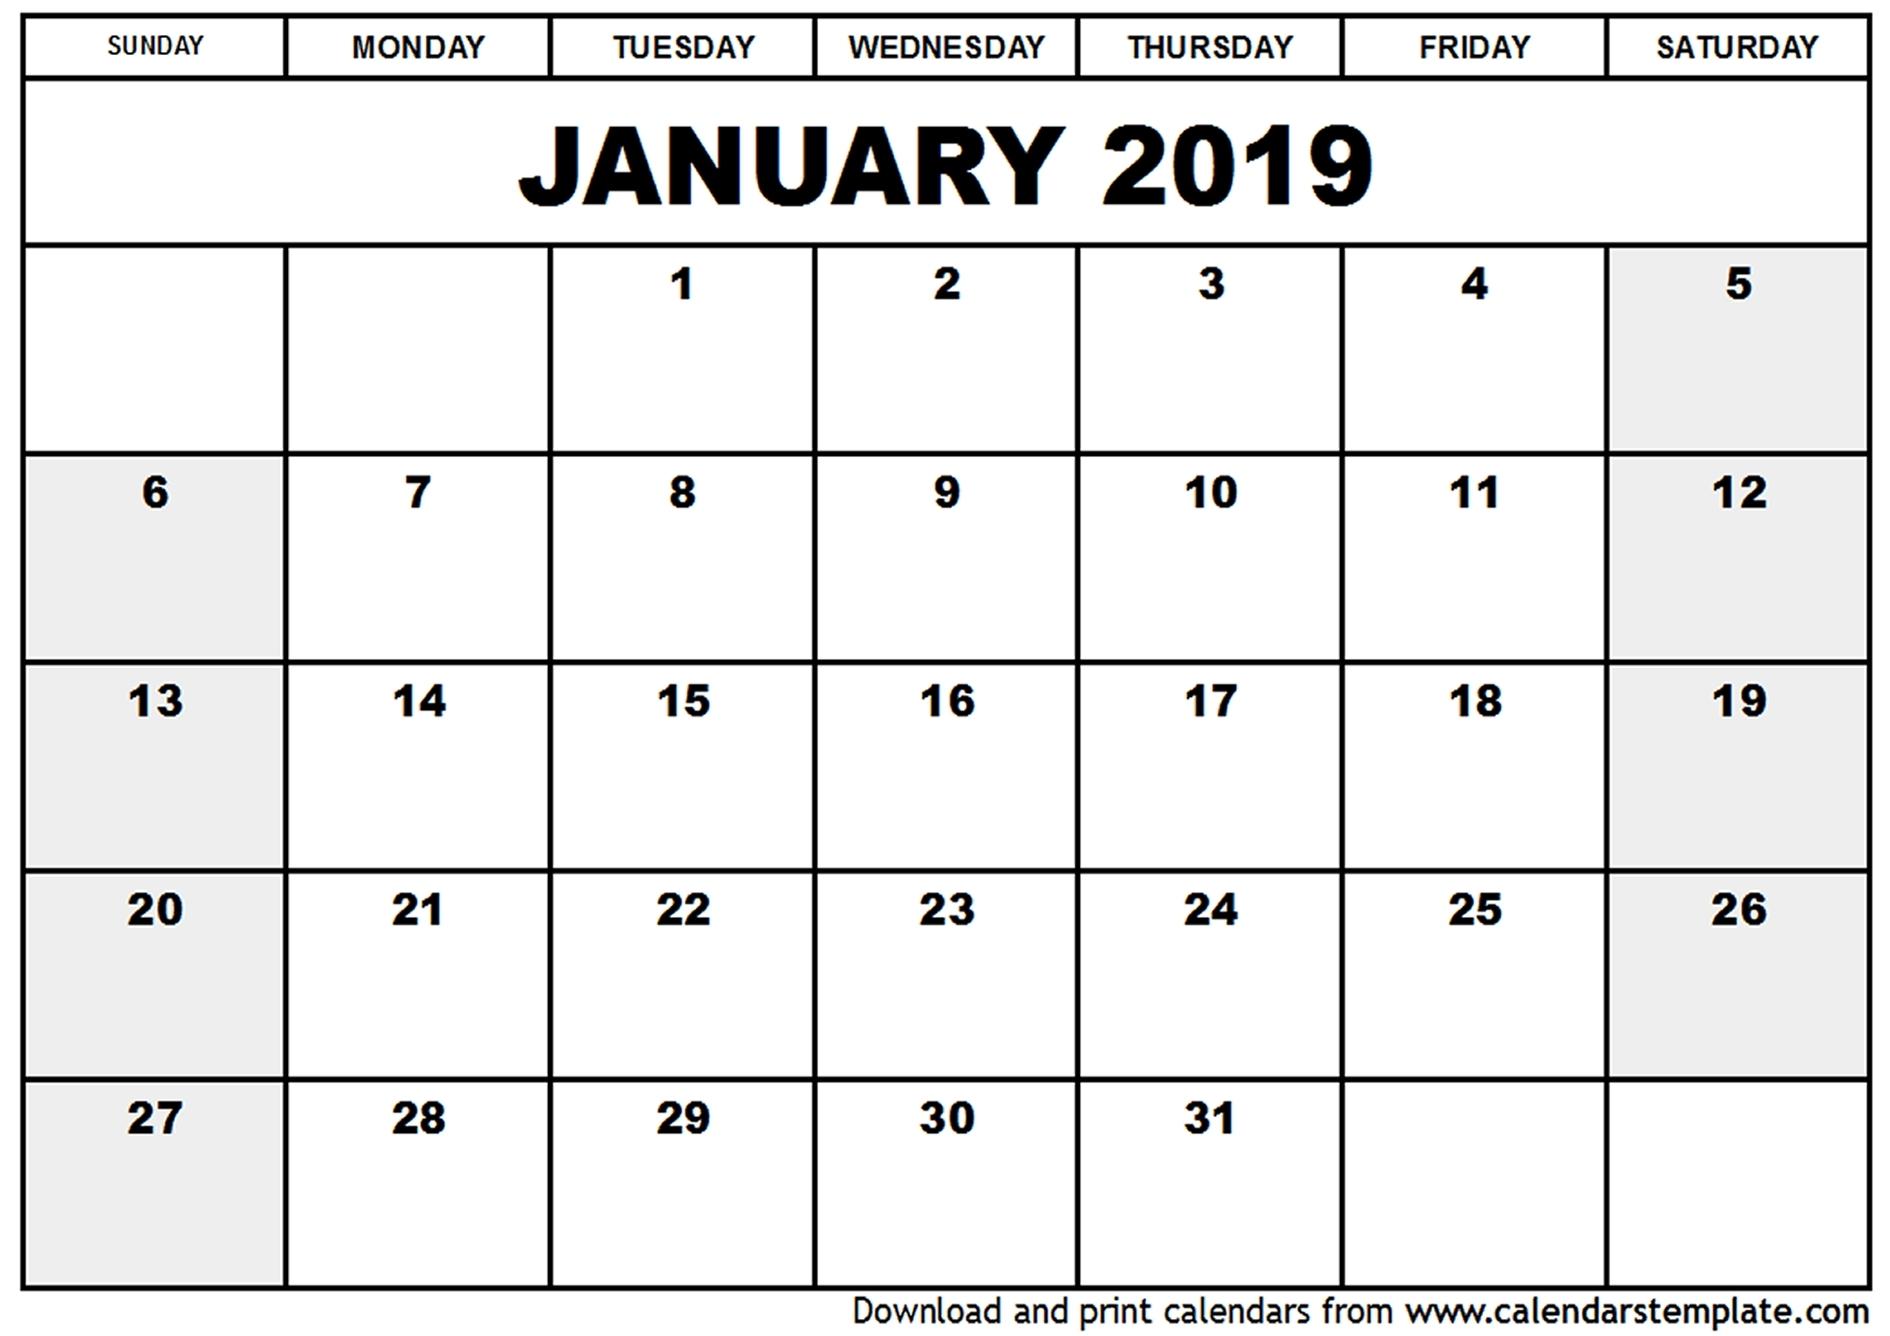 January 2019 Calendar In Excel